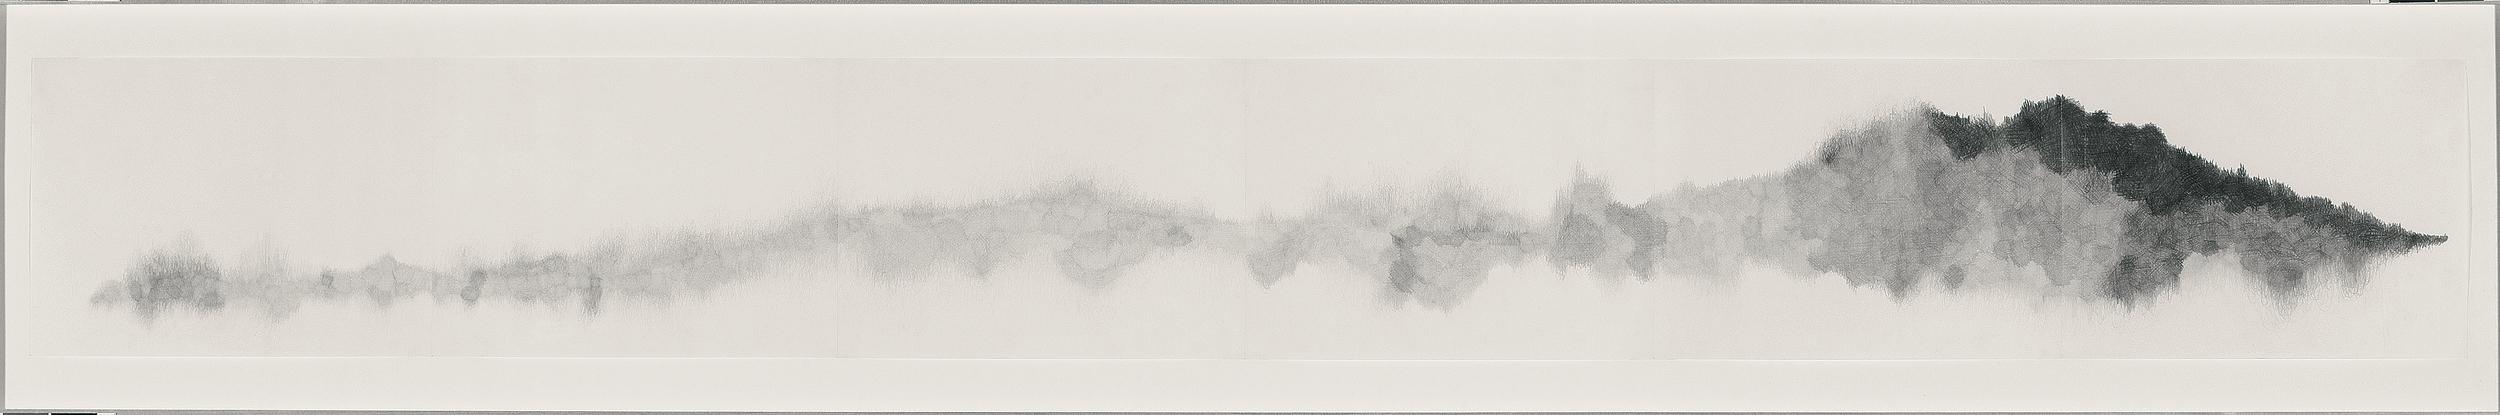 Long Mountain, 2005-06, 8.5 x 86 in.